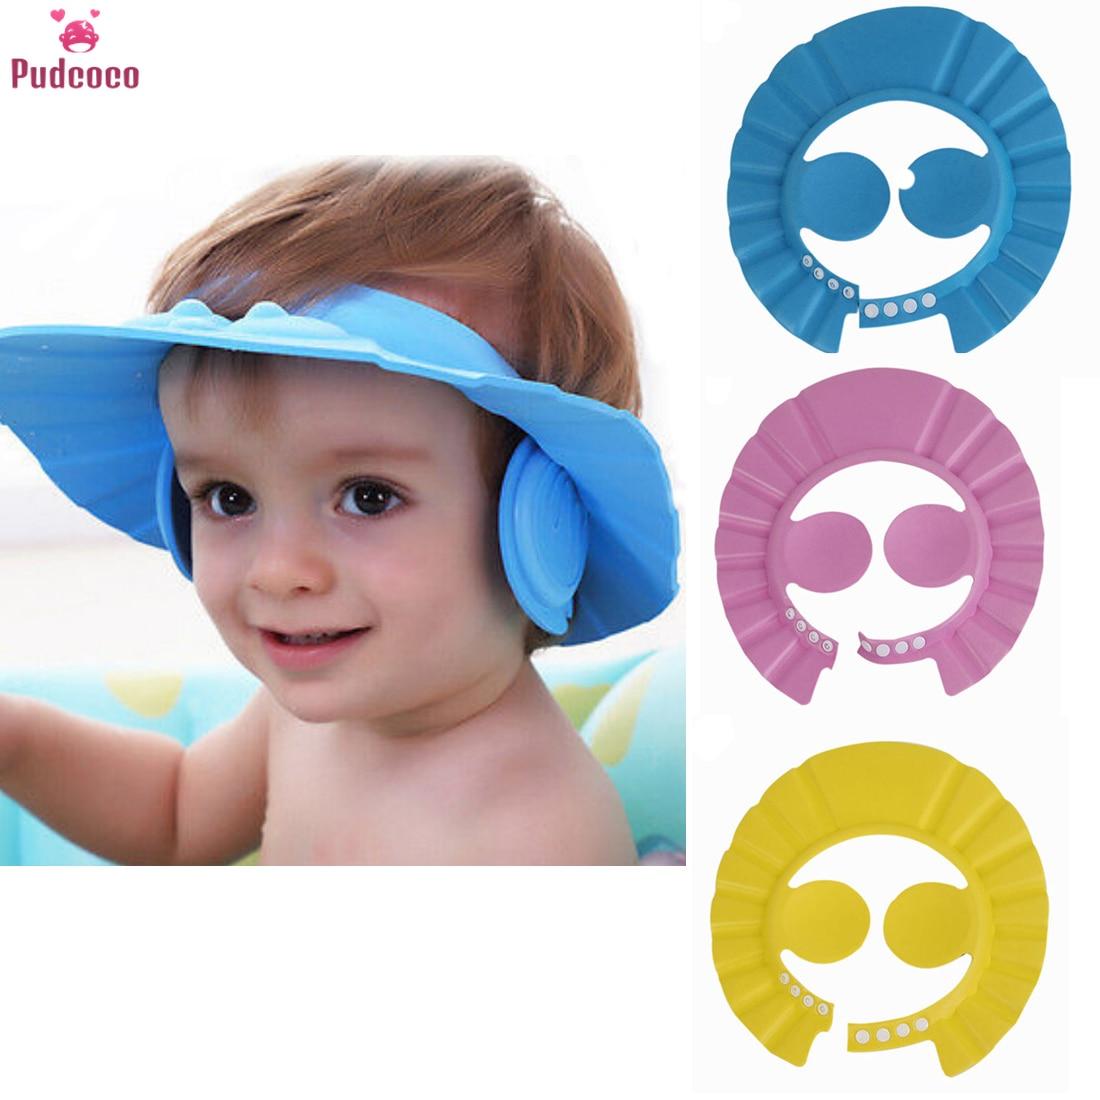 Adjustable Prevent Water Into Ear Baby Waterproof Shampoo Caps Children Kids Bath Wash Hair Shield Shower Hats